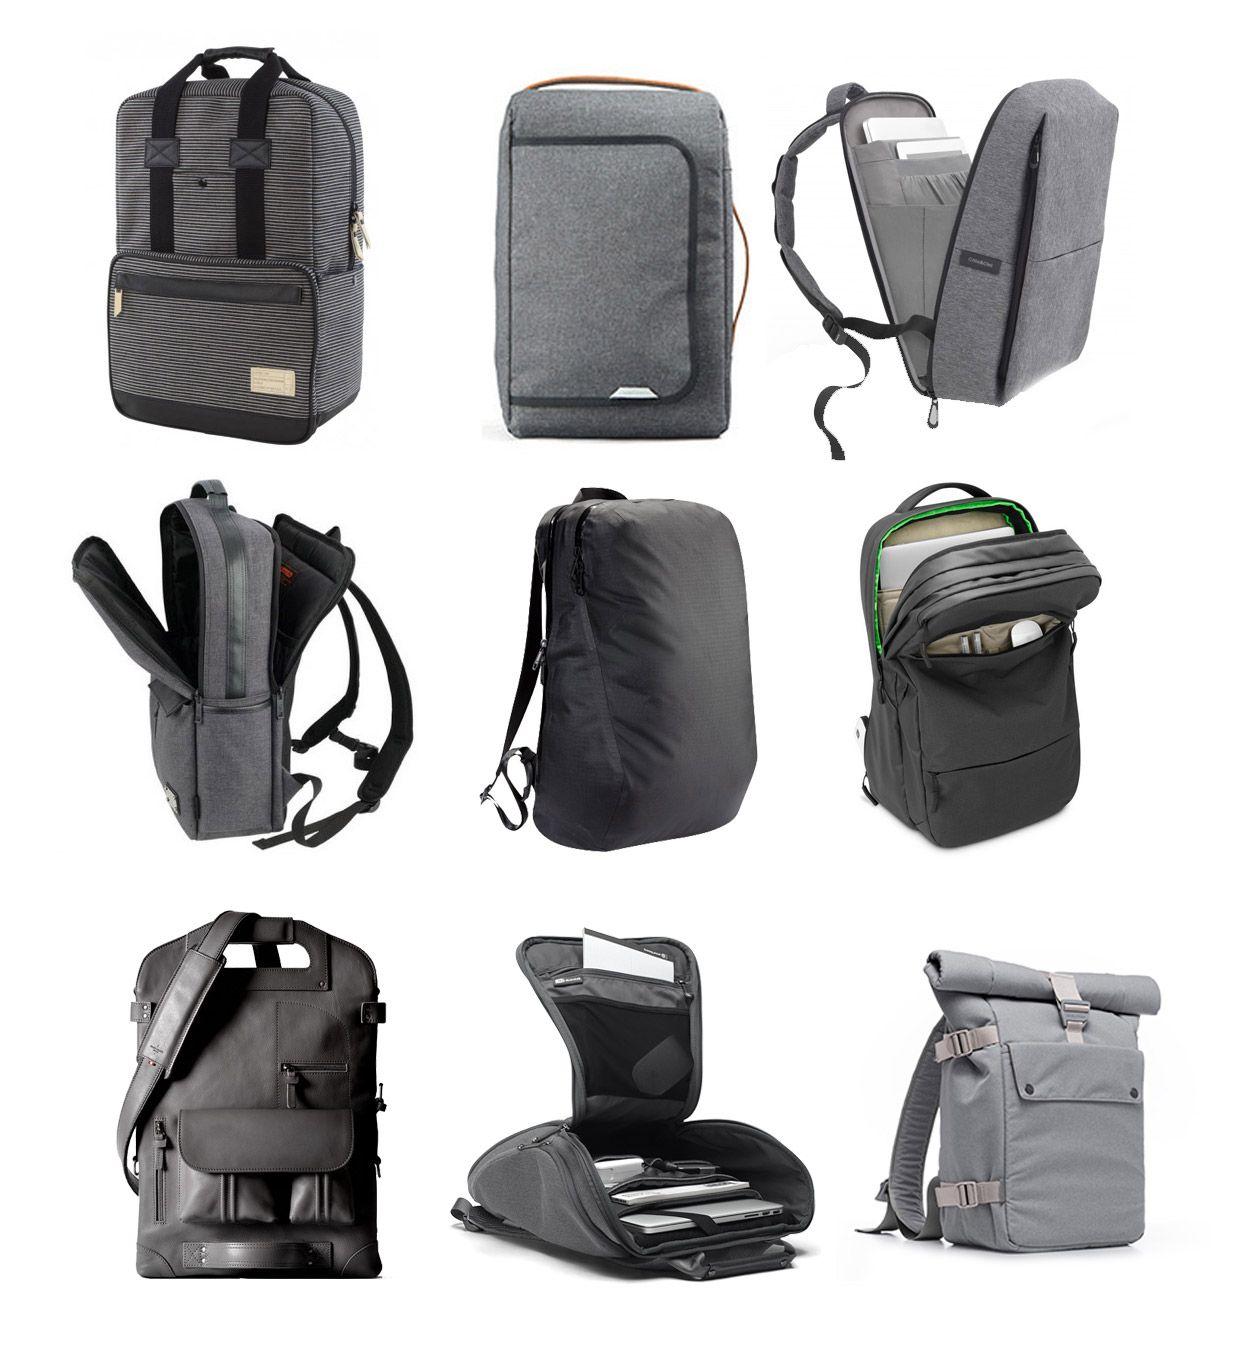 Design Milk on | Best laptop backpack, Aesthetics and Travel backpack